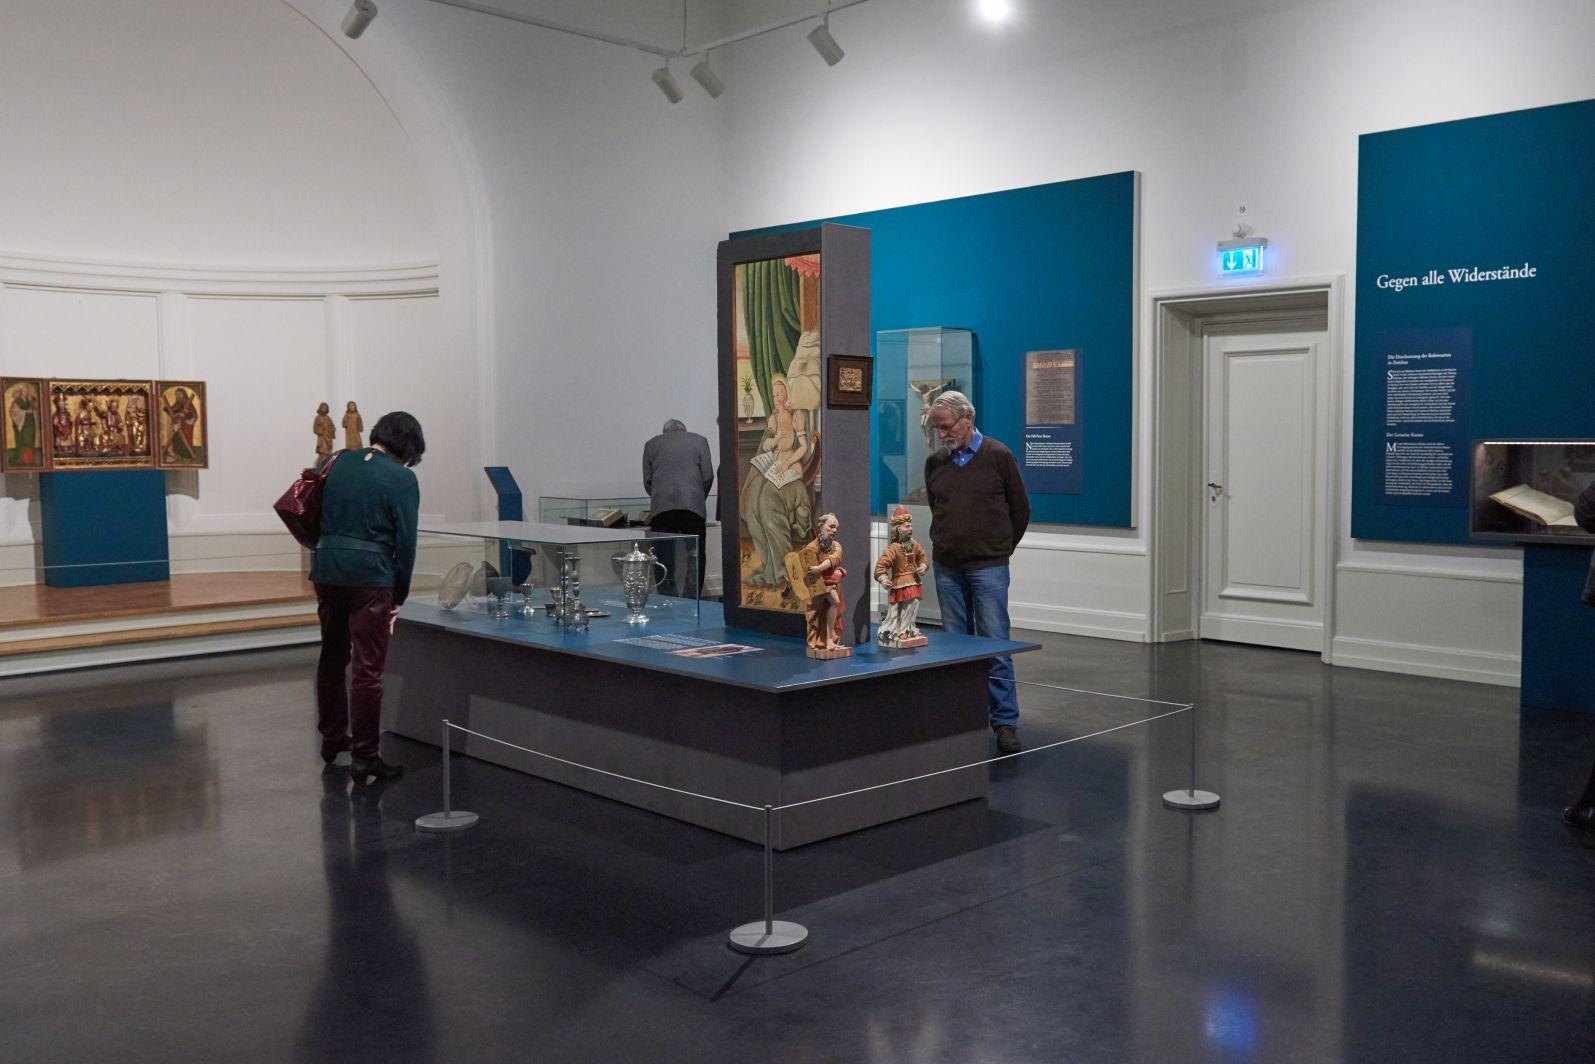 Kunstsammlungen Zwickau, Bild: Fotoatelier Lorenz